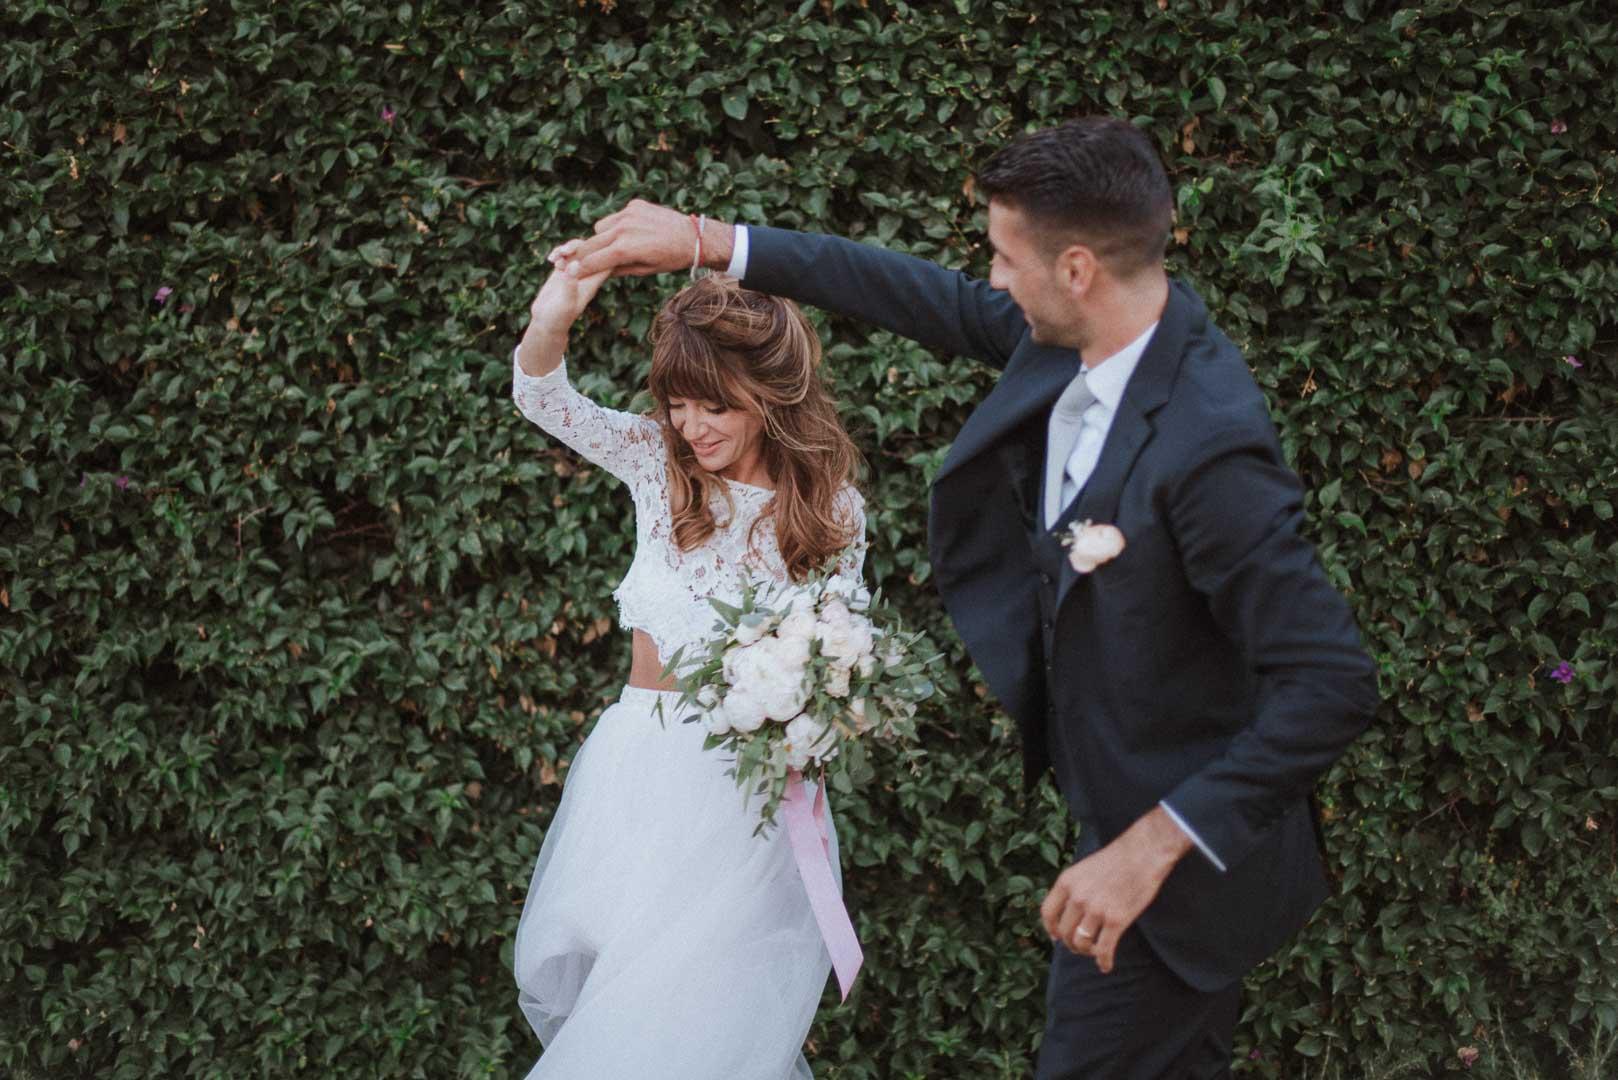 wedding-photographer-destination-fineart-bespoke-reportage-napoli-nabilah-vivianeizzo-spazio46-97